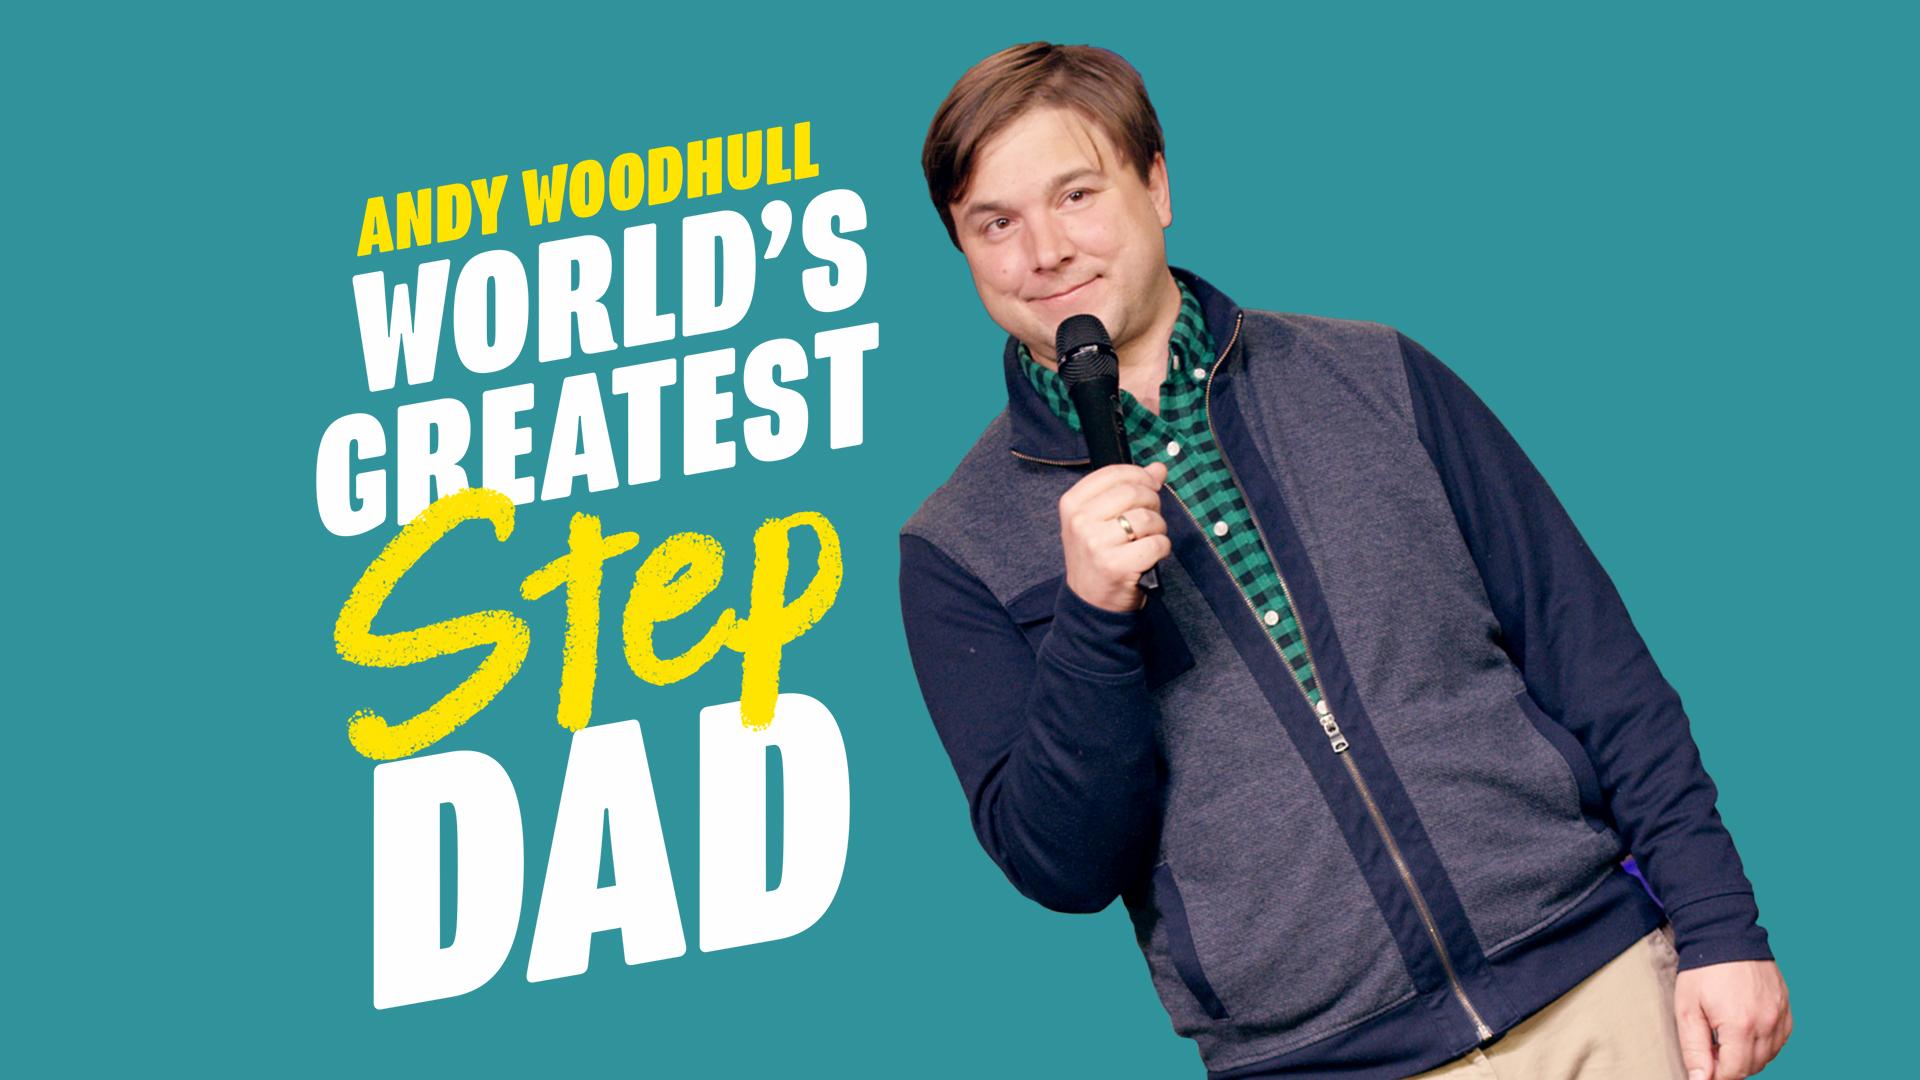 Andy Woodhull: World's Greatest Stepdad